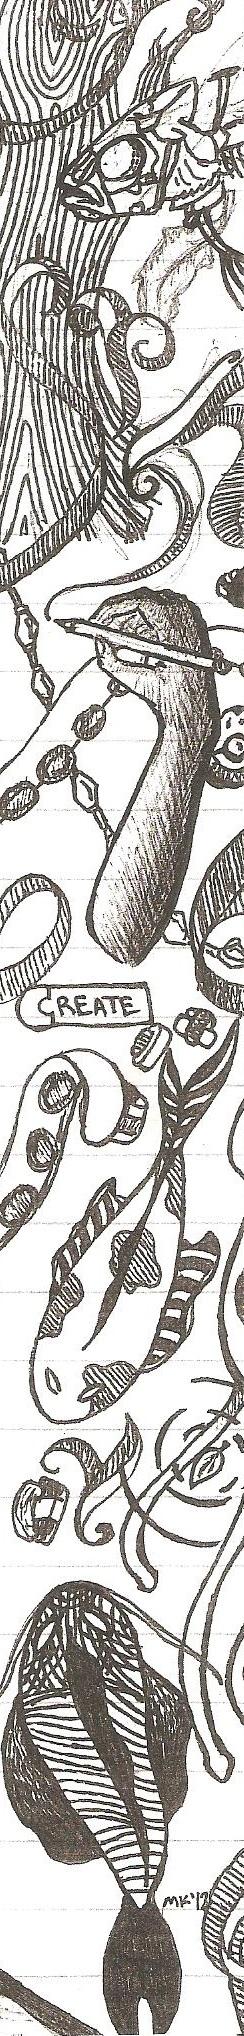 Create - Bookmark by Yshura